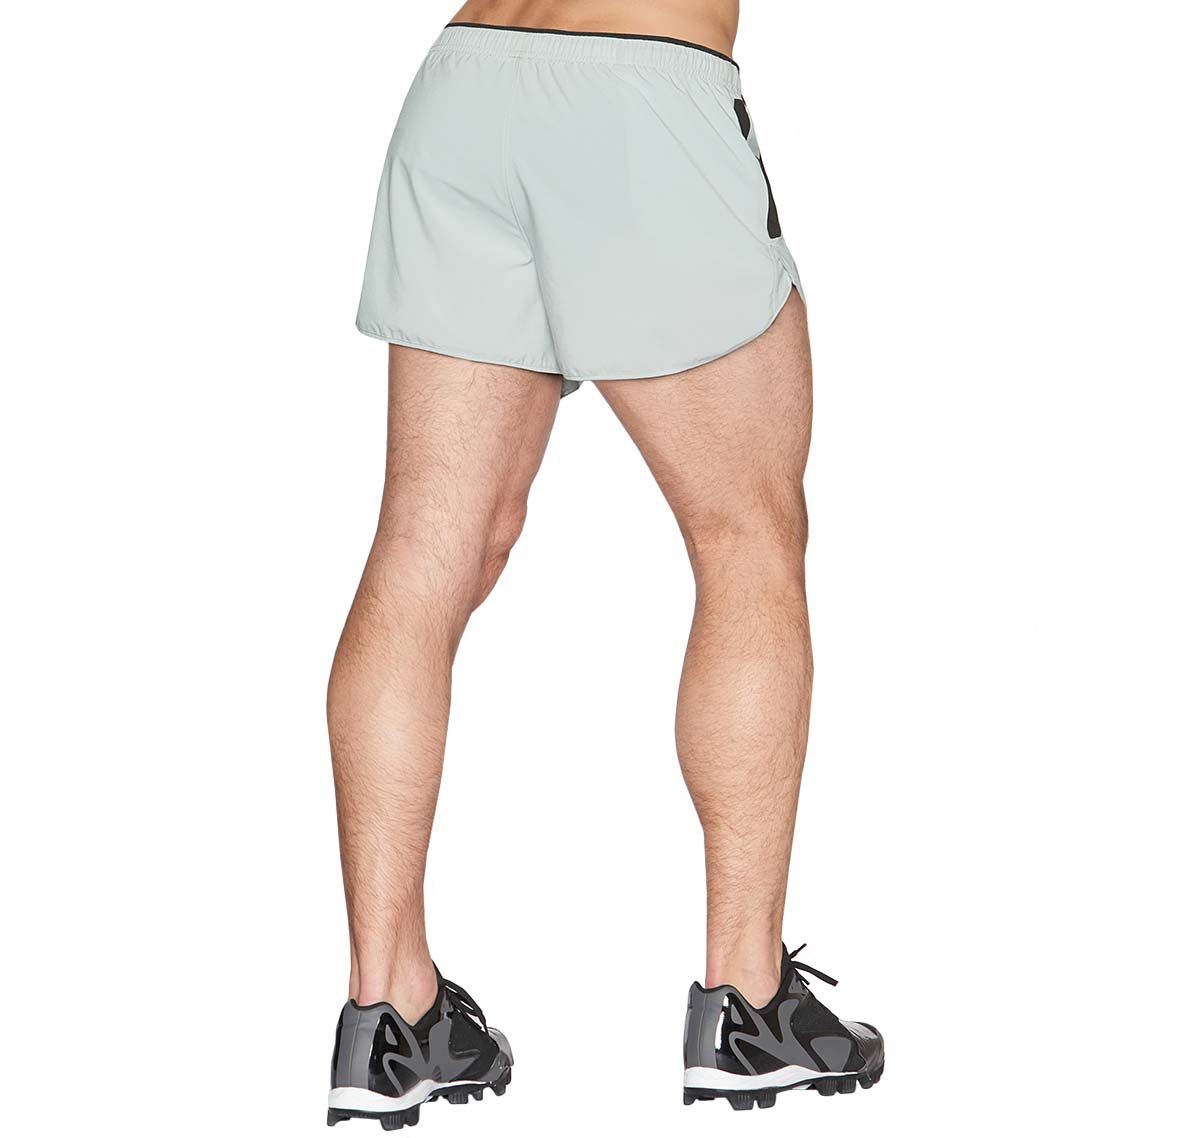 C-IN2 Pantaloni sportivi corti GRIP ATHLETHIC RUN SHORT 4965-019, grigio